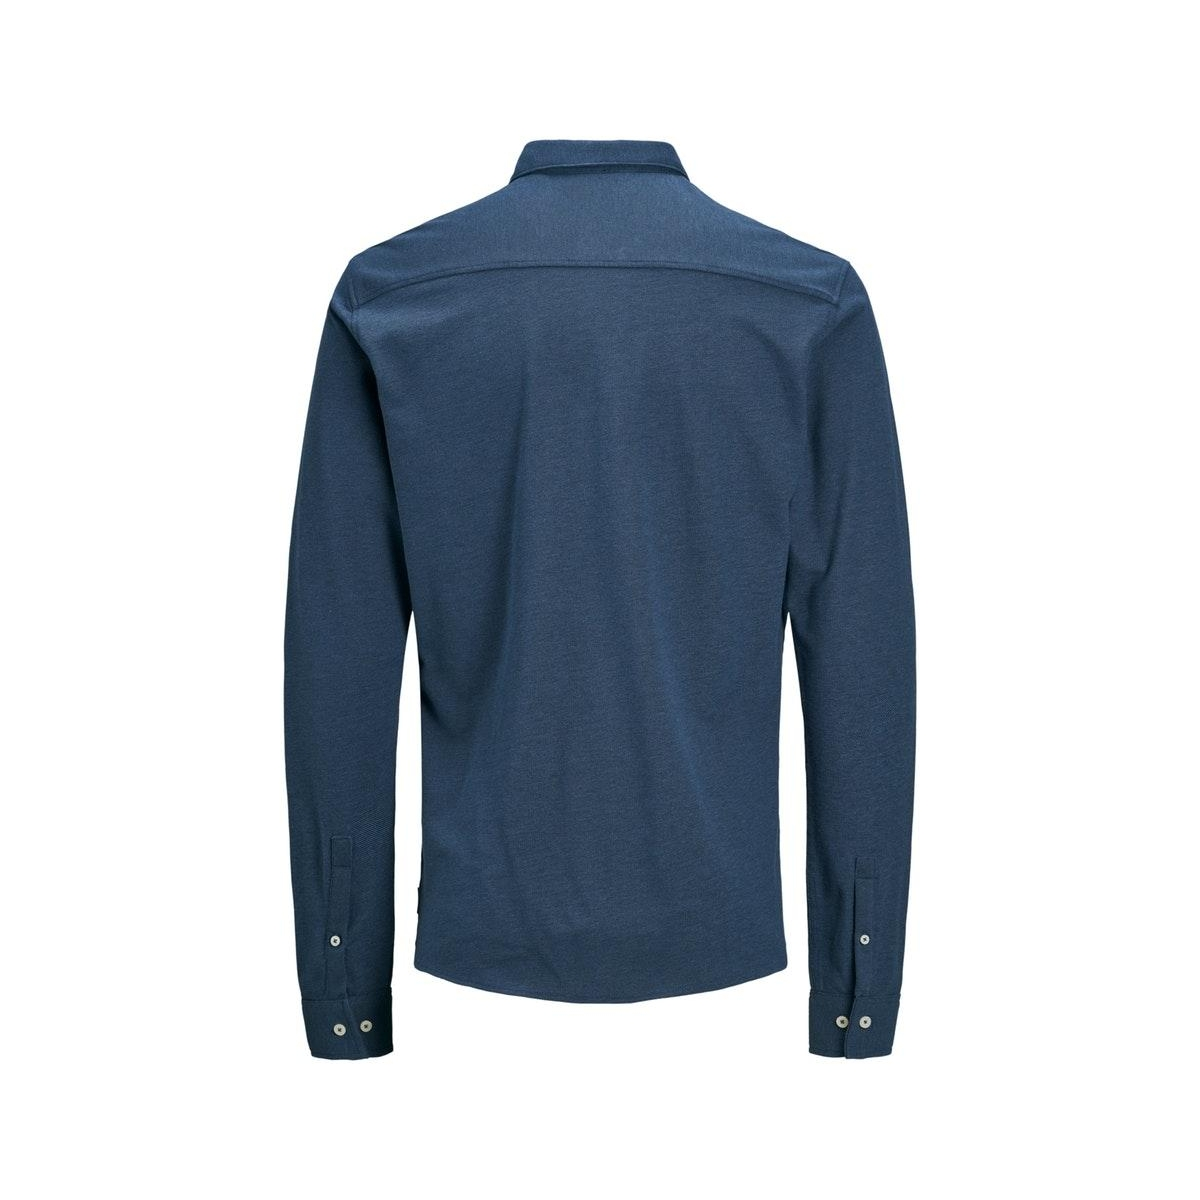 jprtheo bla. ls jersey shirt 12171117 jack & jones overhemd true navy/slim fit